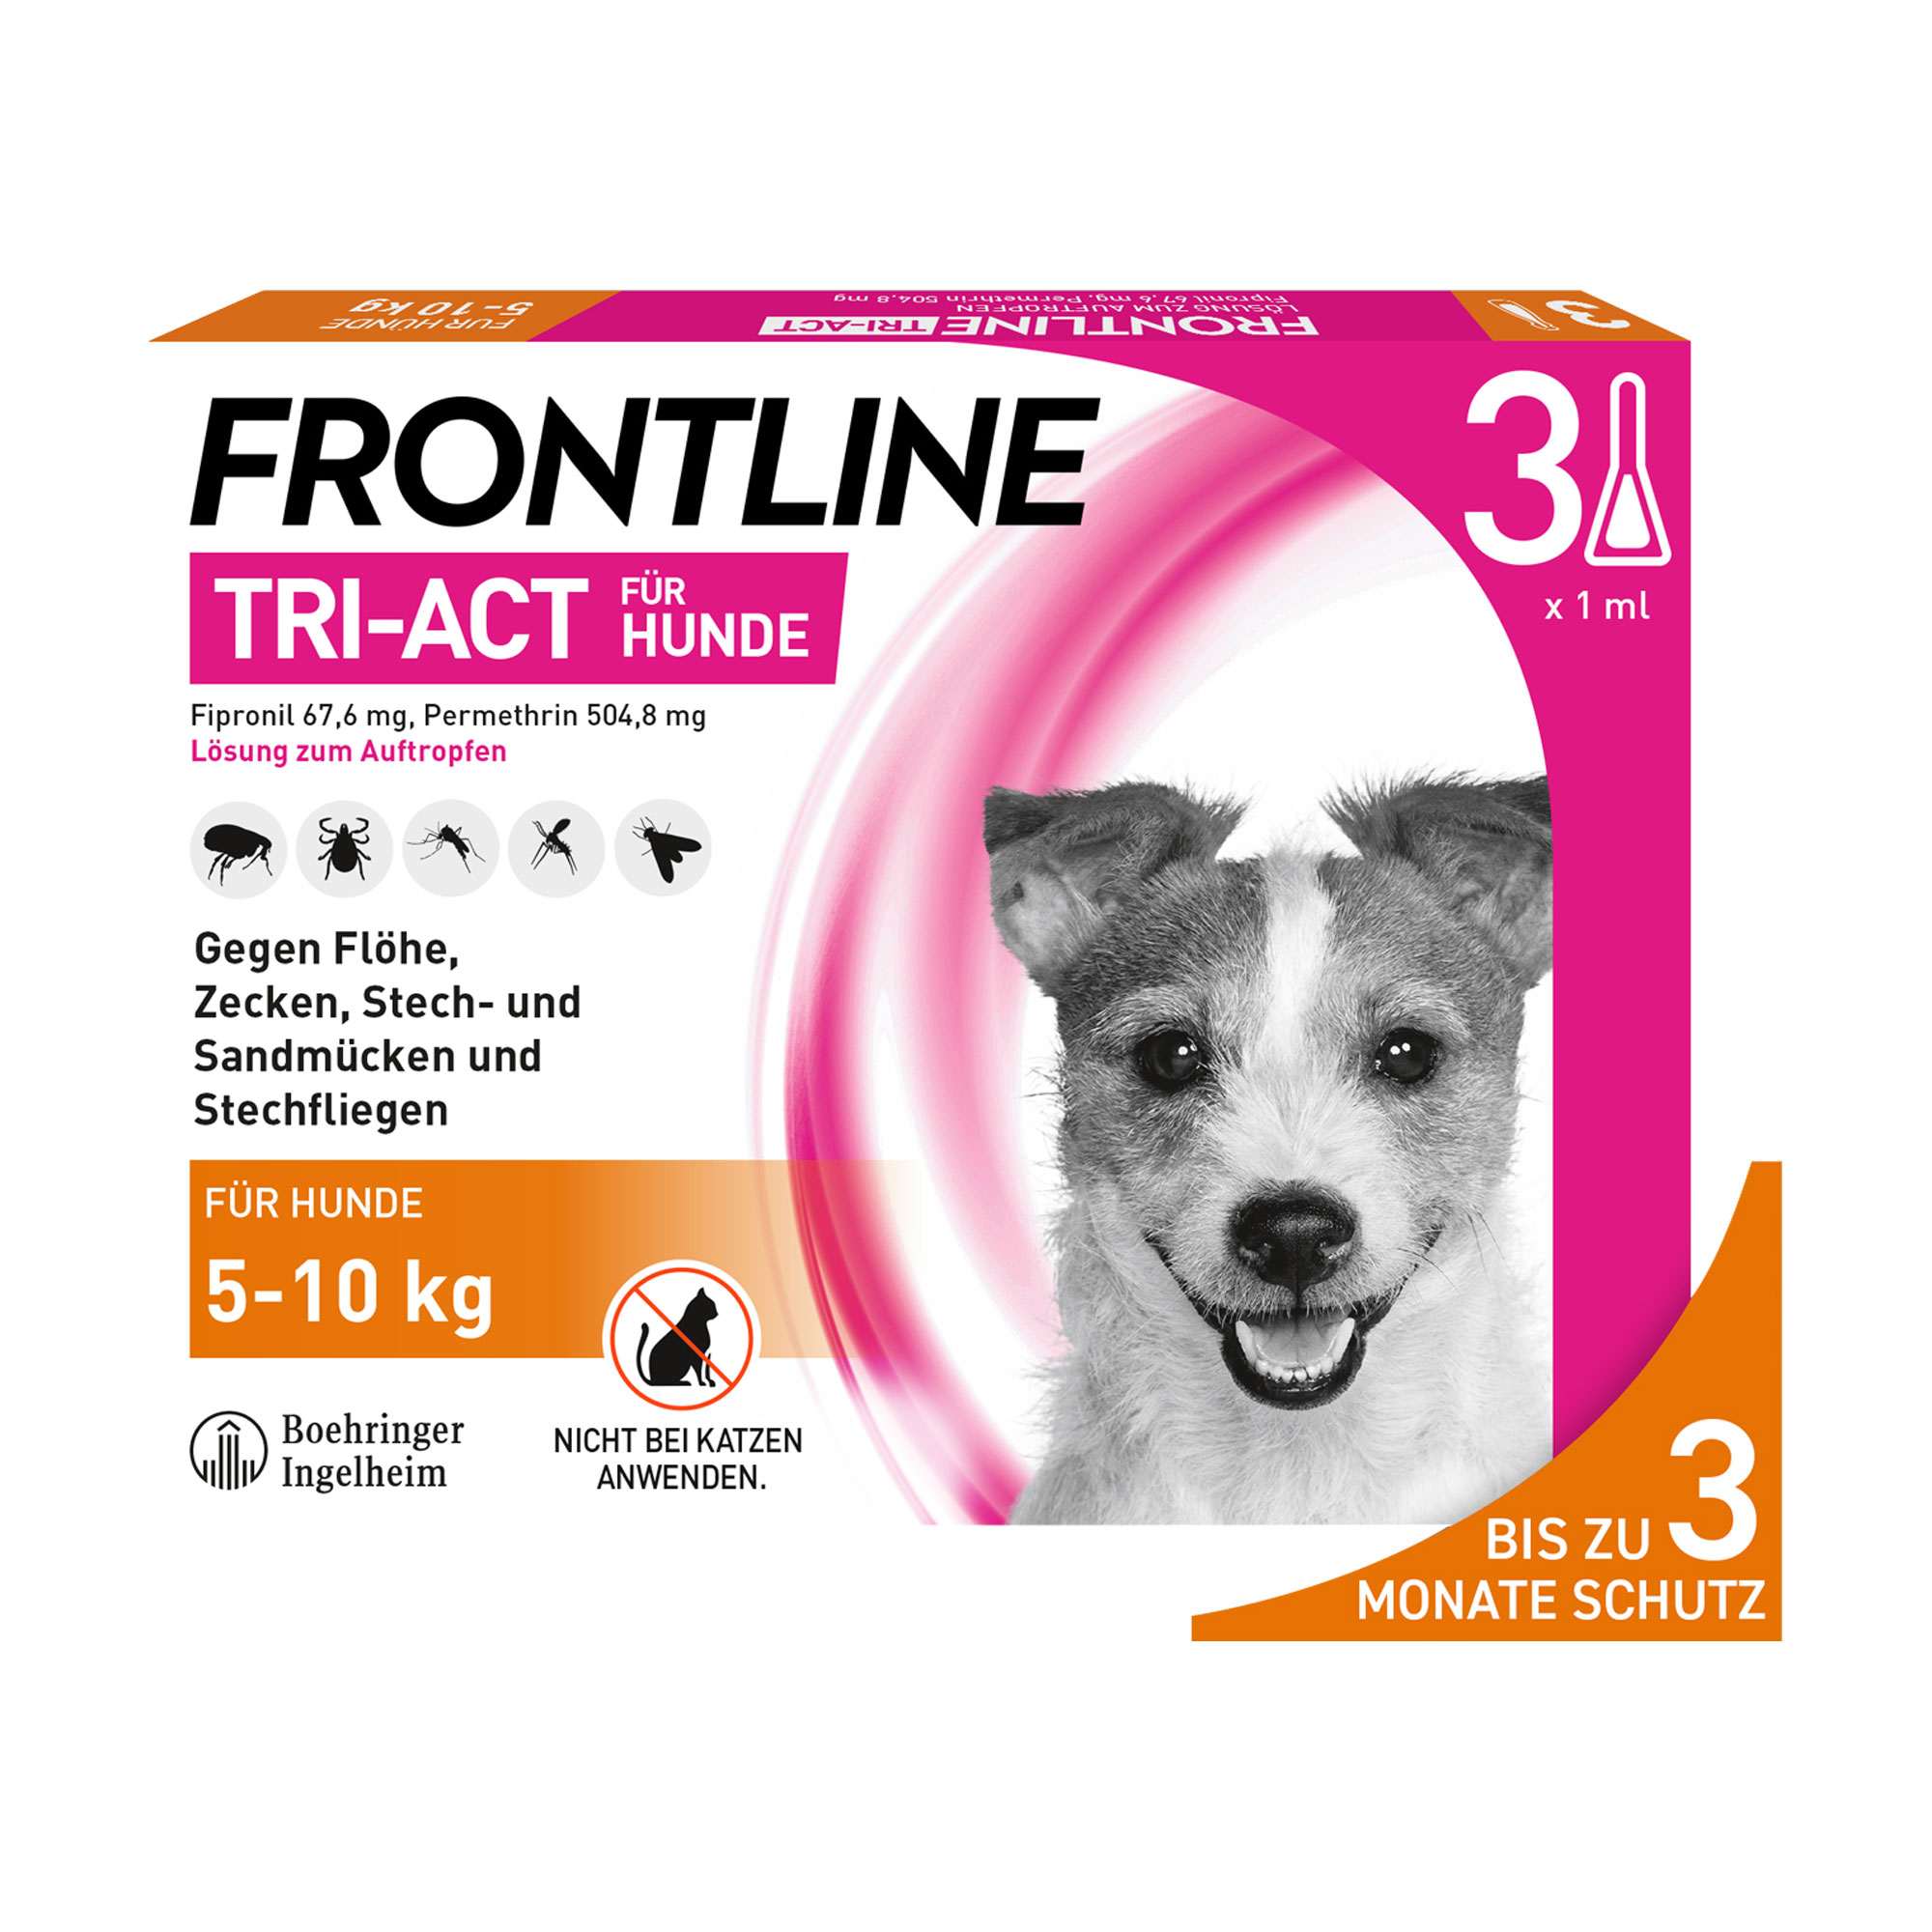 Frontline Tri-Act Hunde 5-10 kg